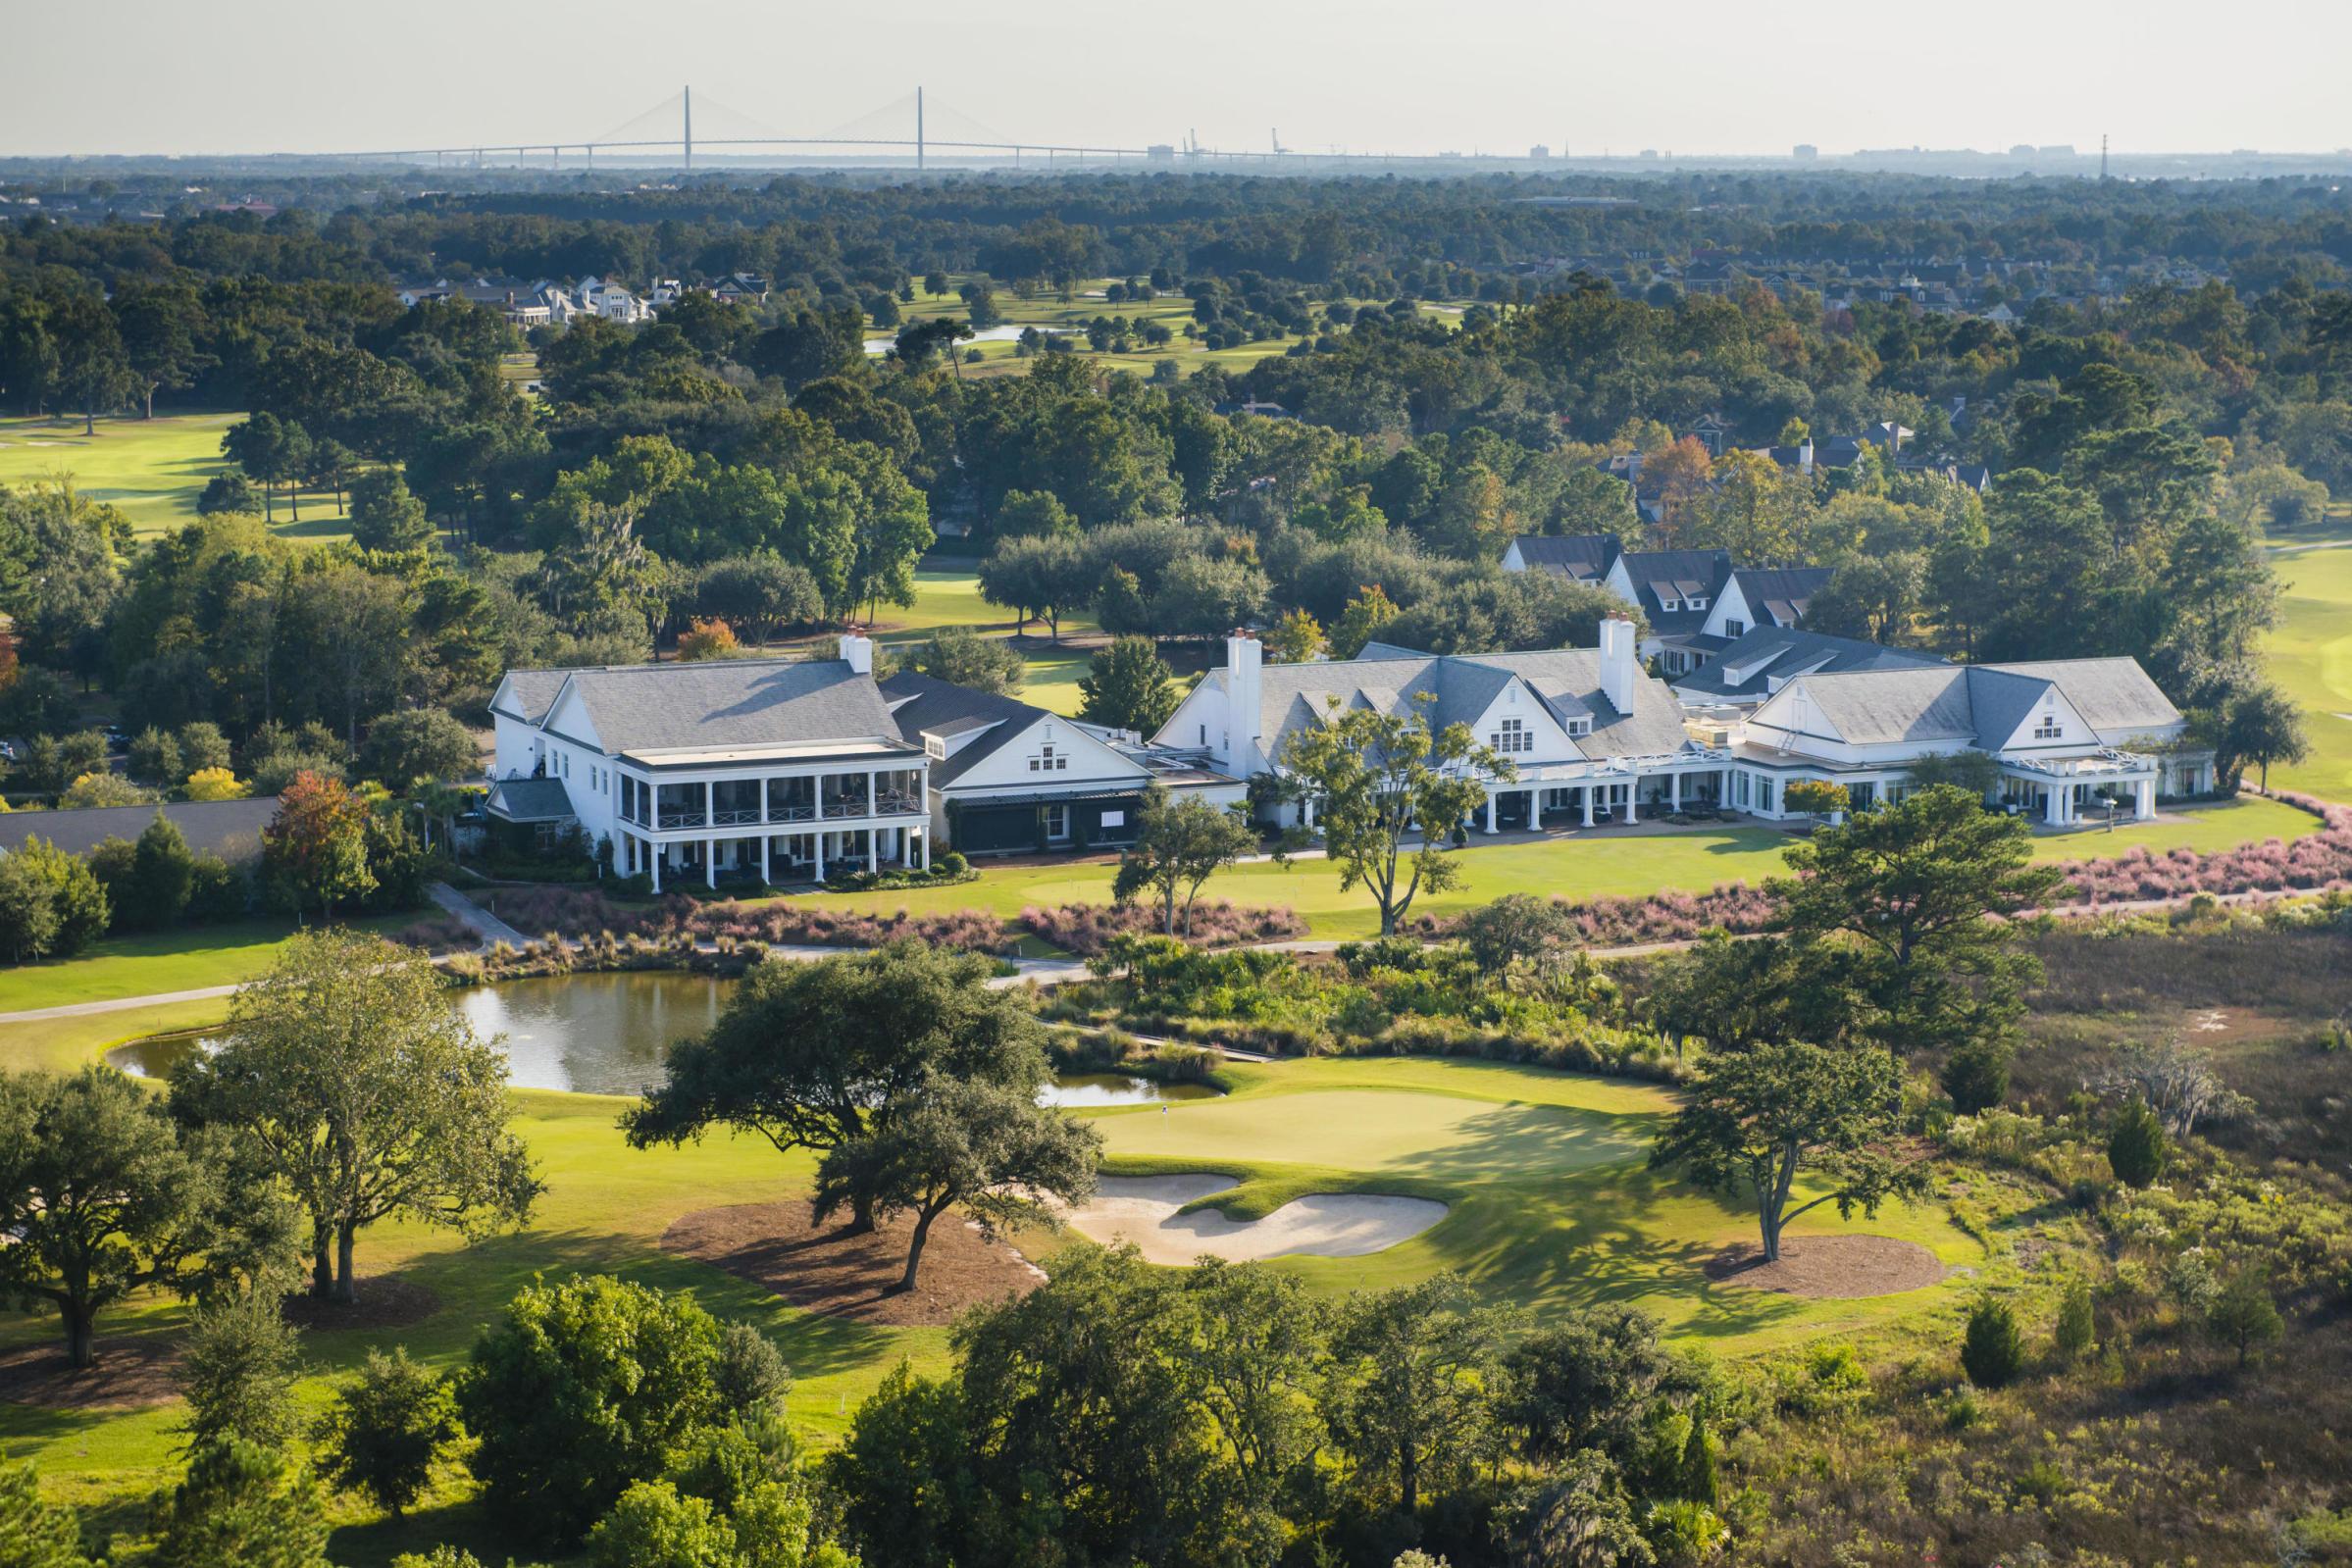 Daniel Island Park Homes For Sale - 231 Delahow, Daniel Island, SC - 39